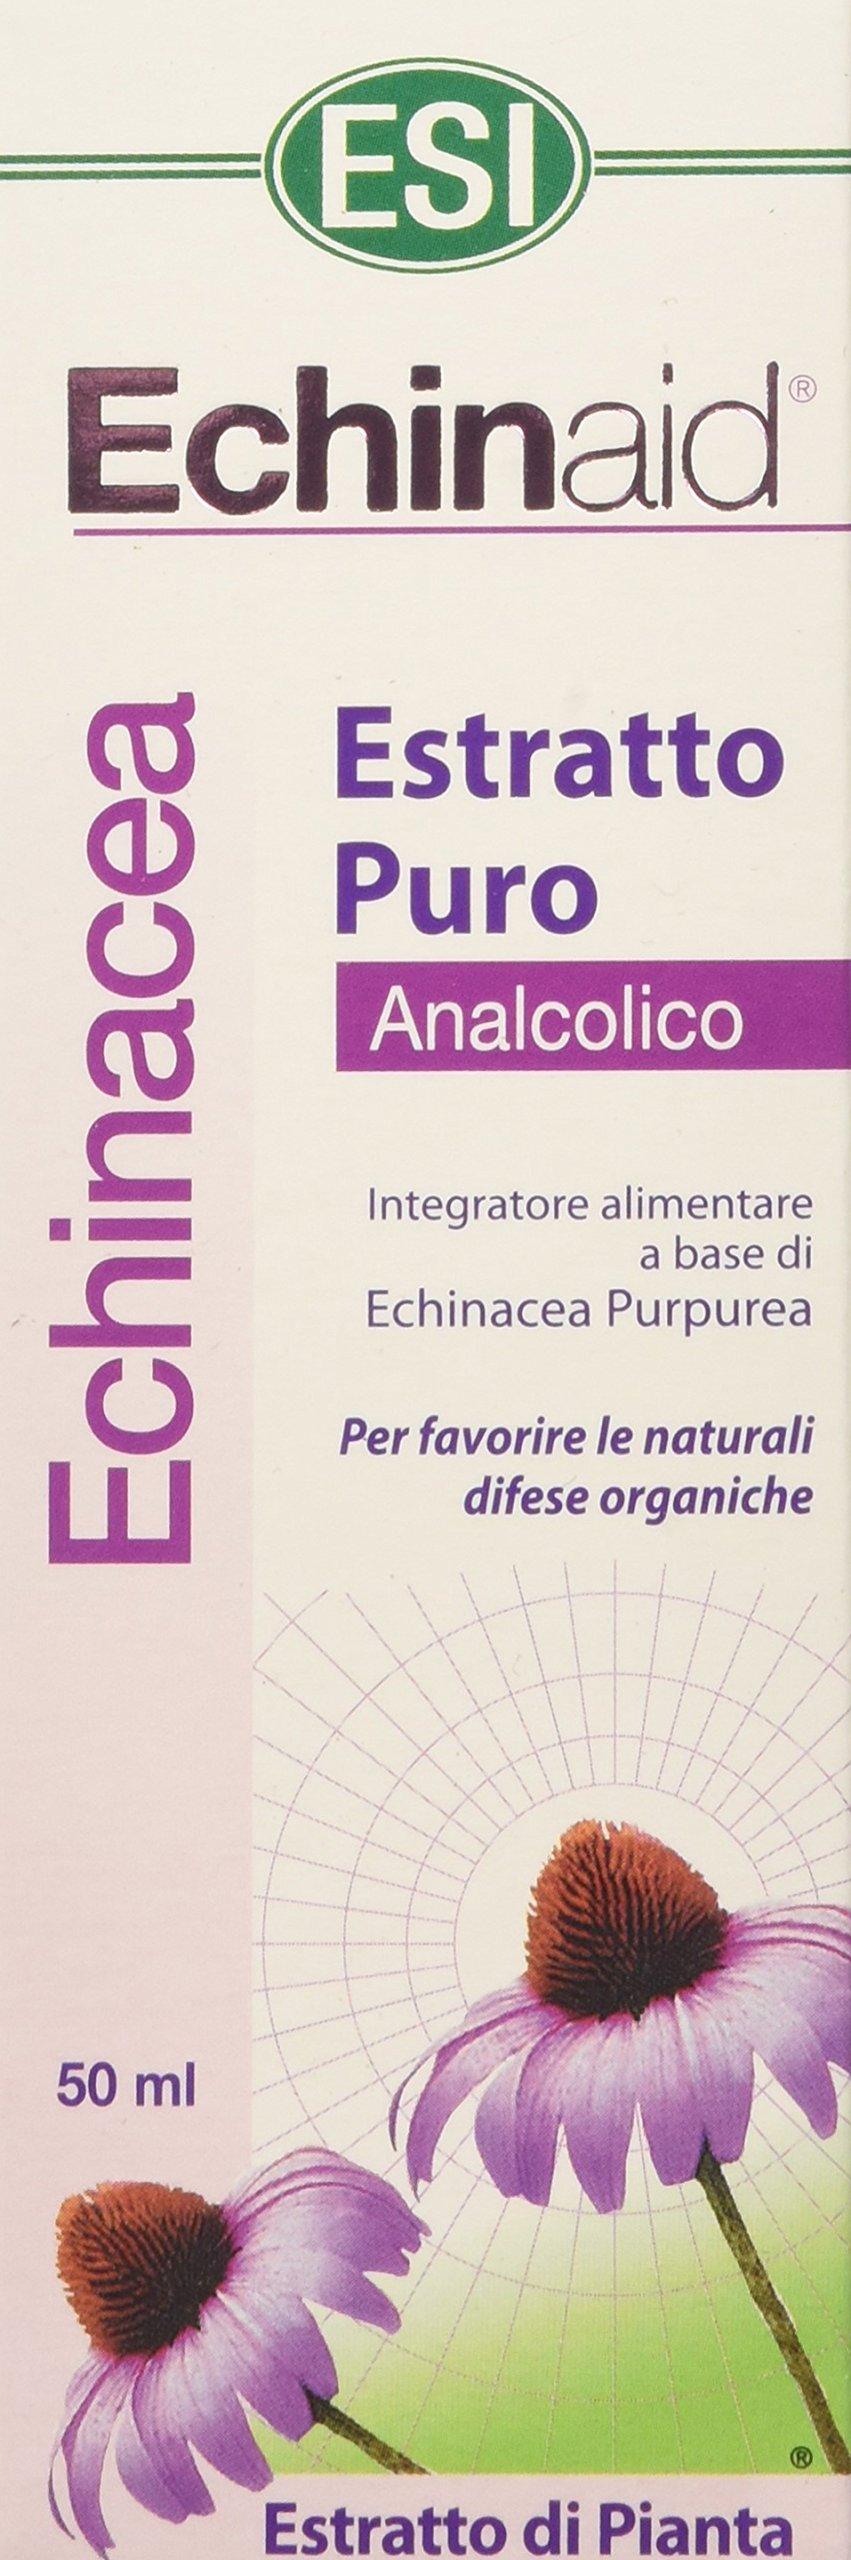 Echinaid Estratto Puro Analcolico - 50 ml 1 spesavip